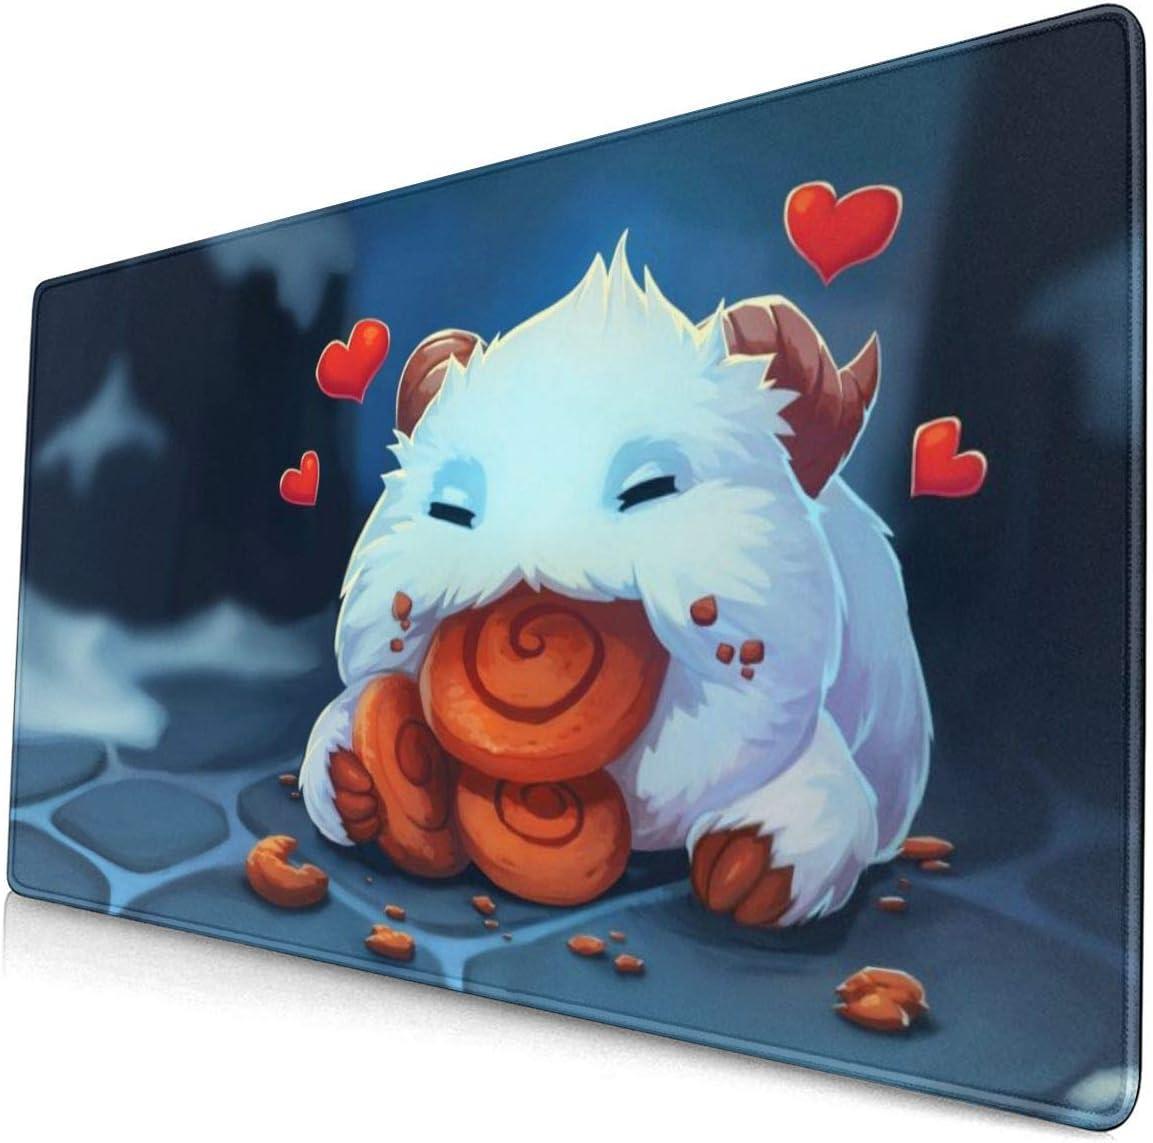 Details about  /F3980 Free Mat Bag League of Legends LOL Gaming Mat Large Mouse Pad Desk Mat